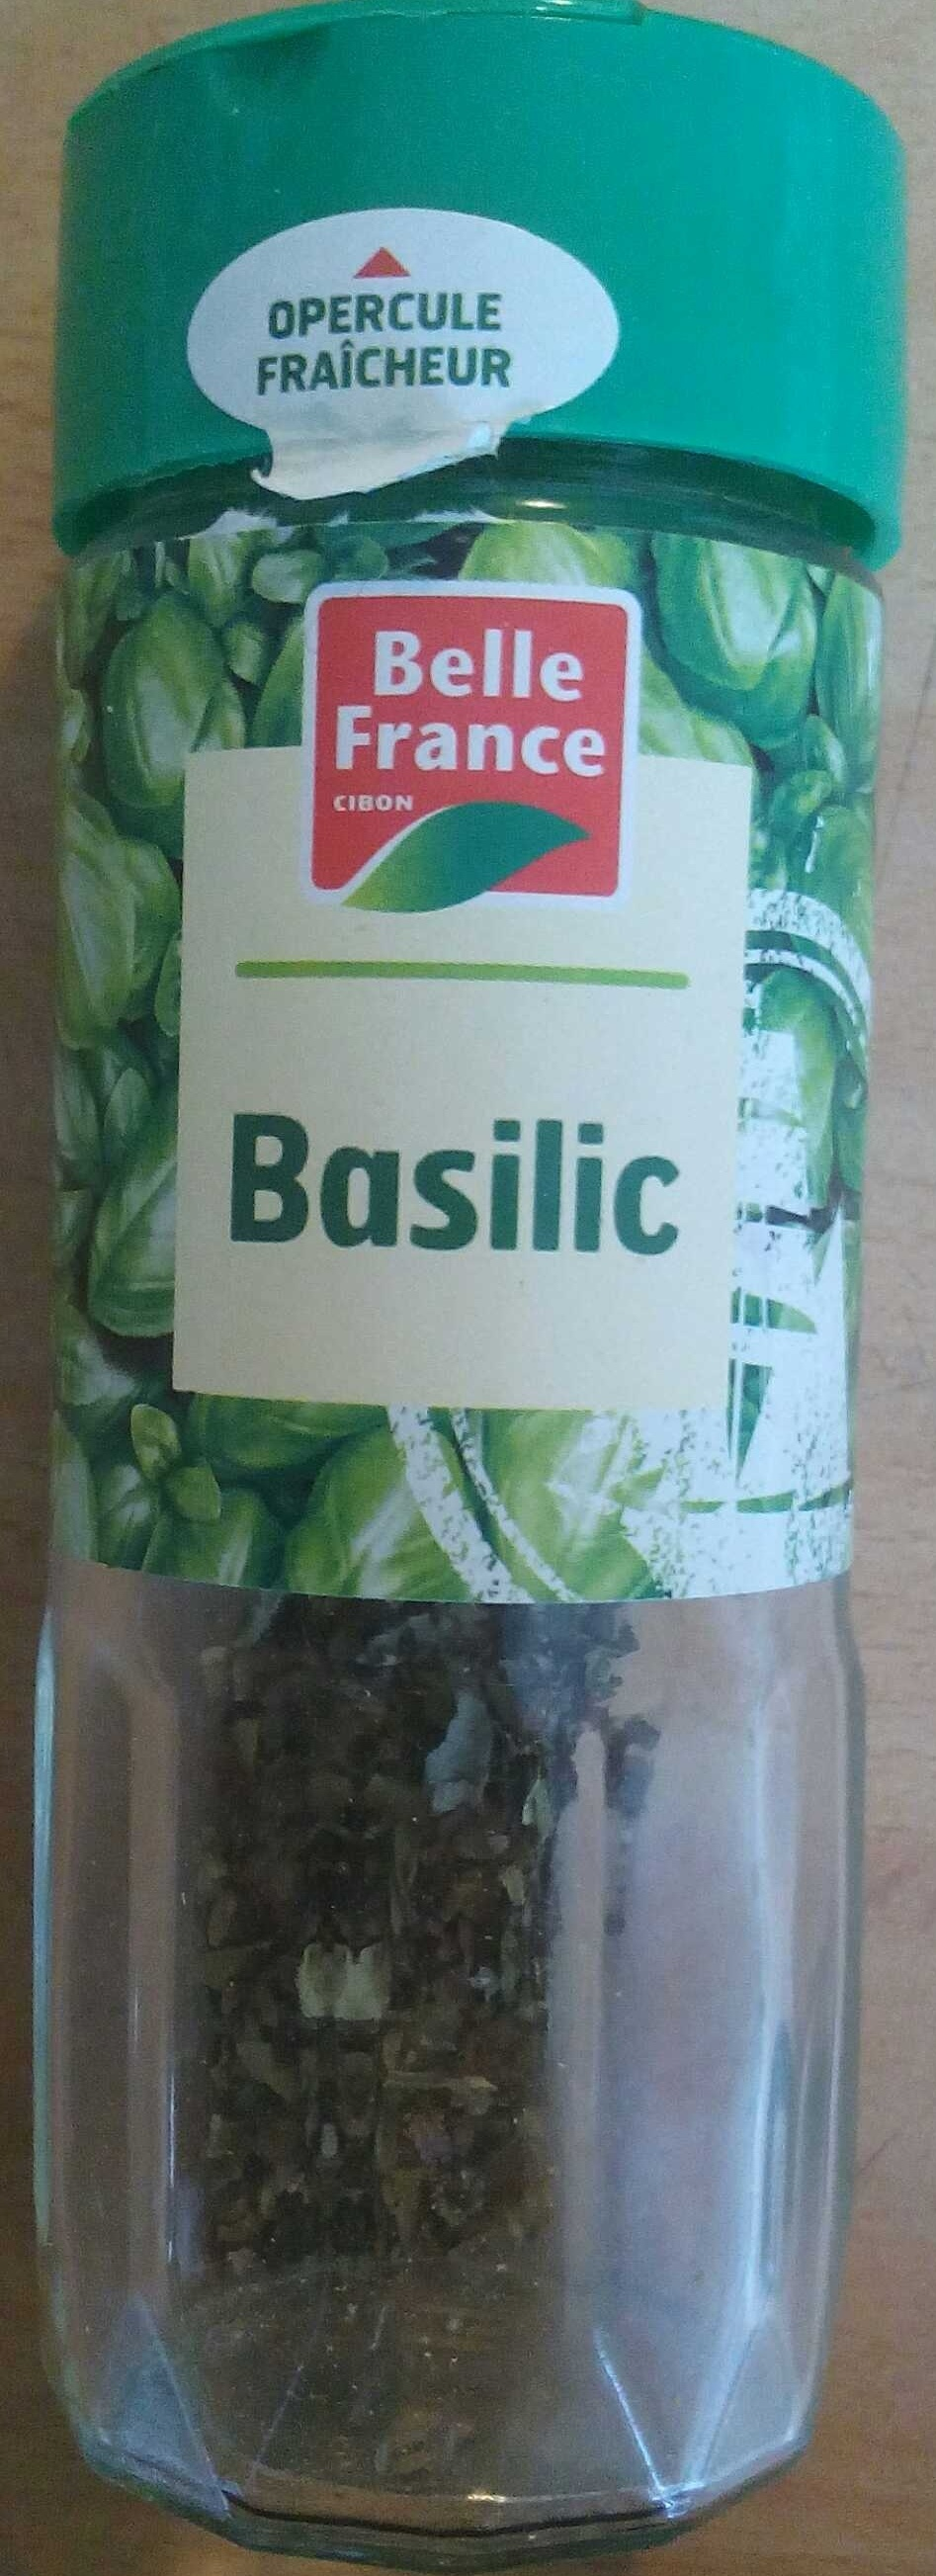 Basilic belle france 15 g - Basilic seche a ne pas consommer ...